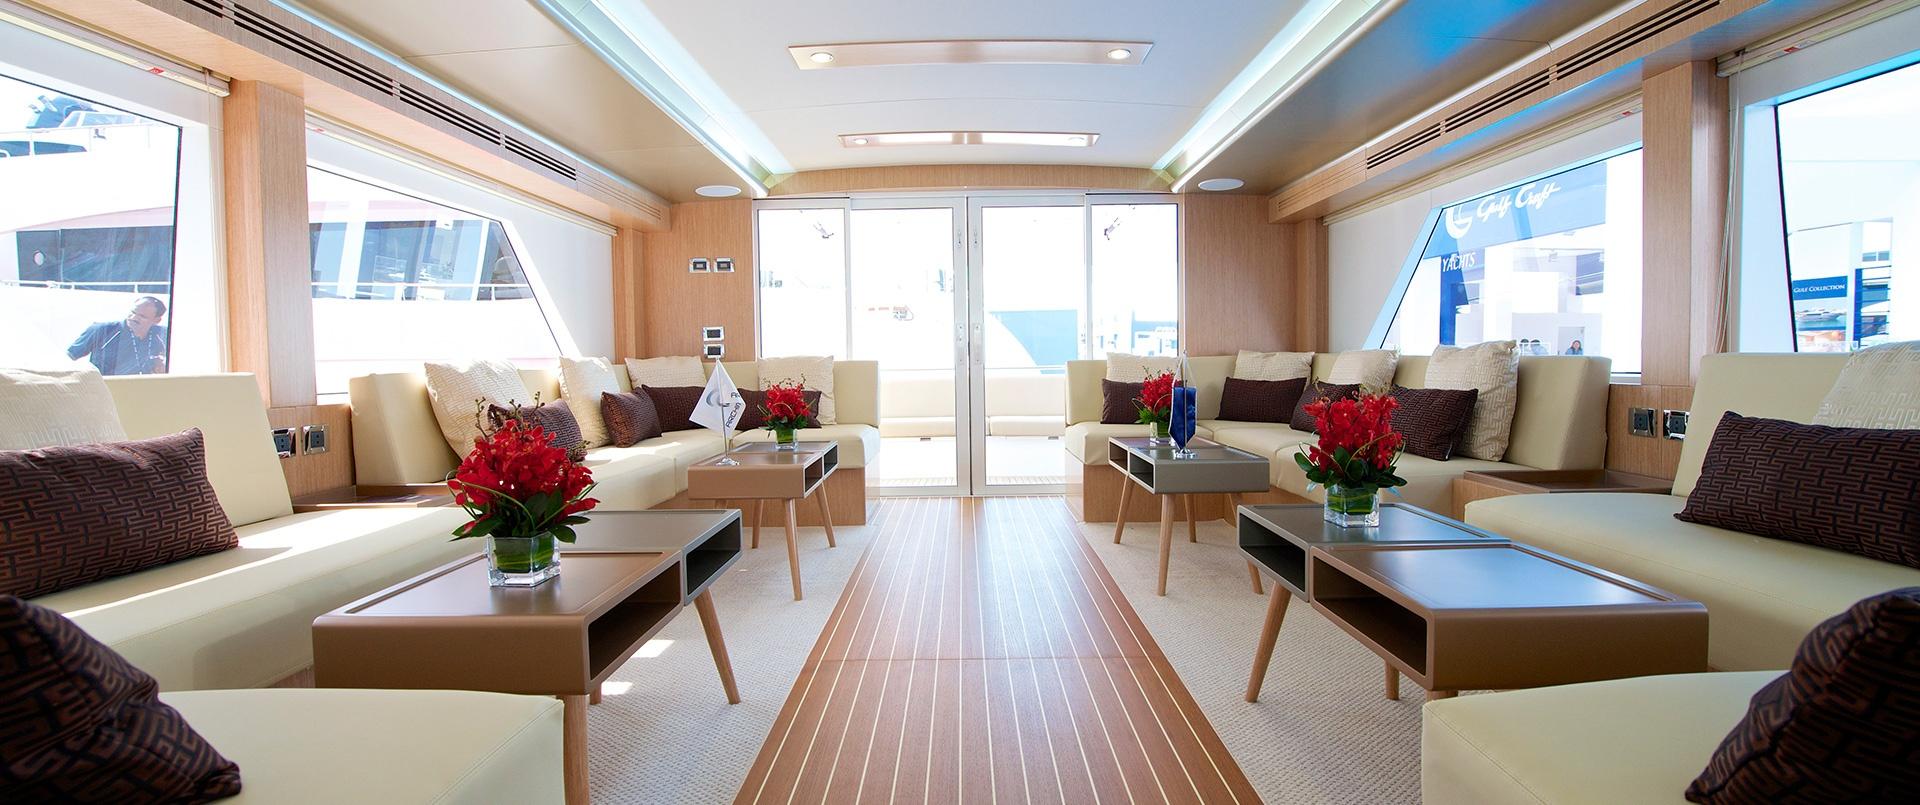 Saloon aboard the Waveshuttle 56 by Gulf Craft